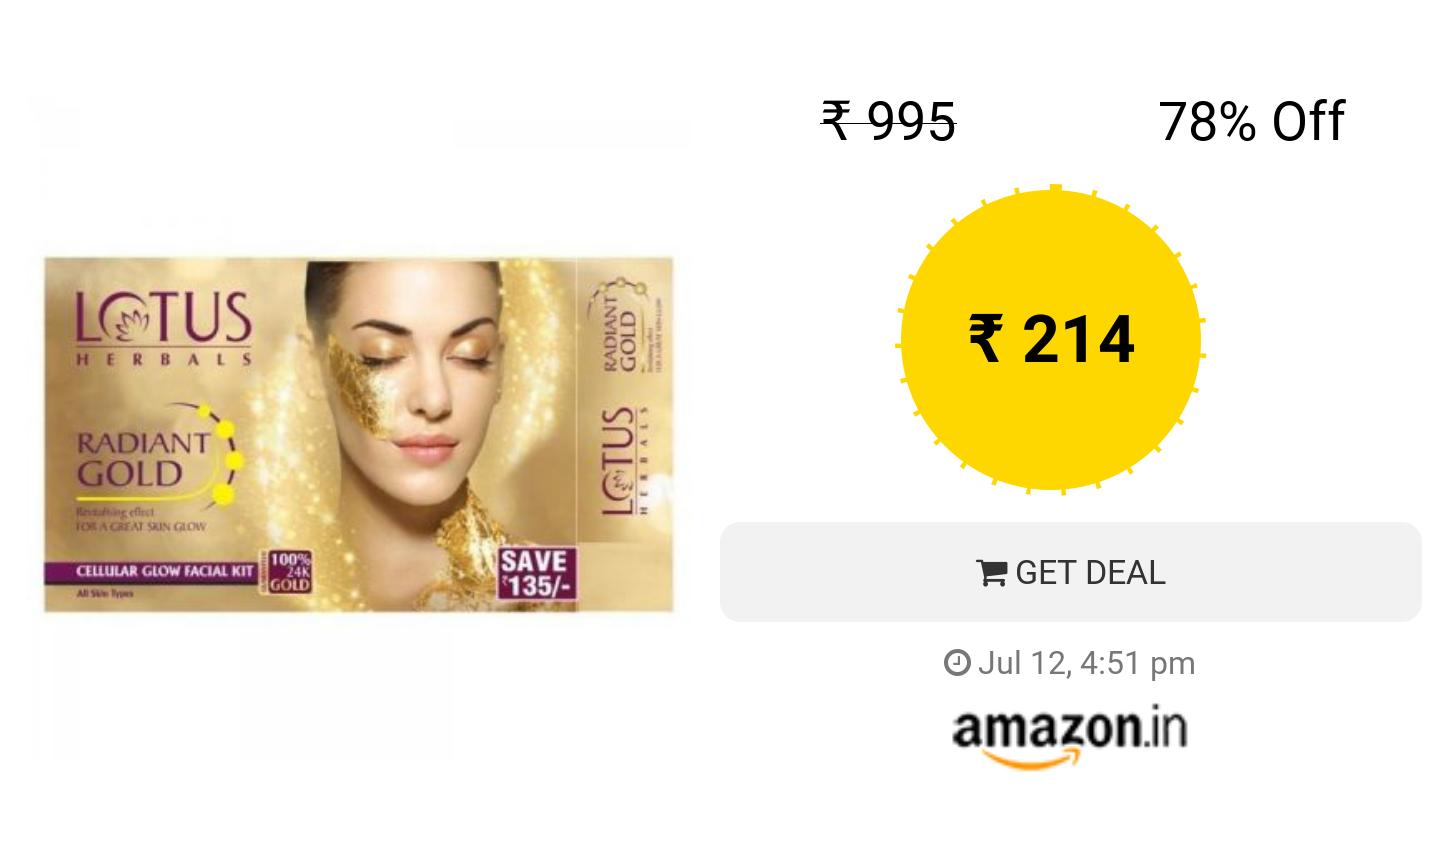 76aa9b3fb7 Lotus Herbal Radiant Gold Cellular Glow Facial Kit, 37g | Deals ...